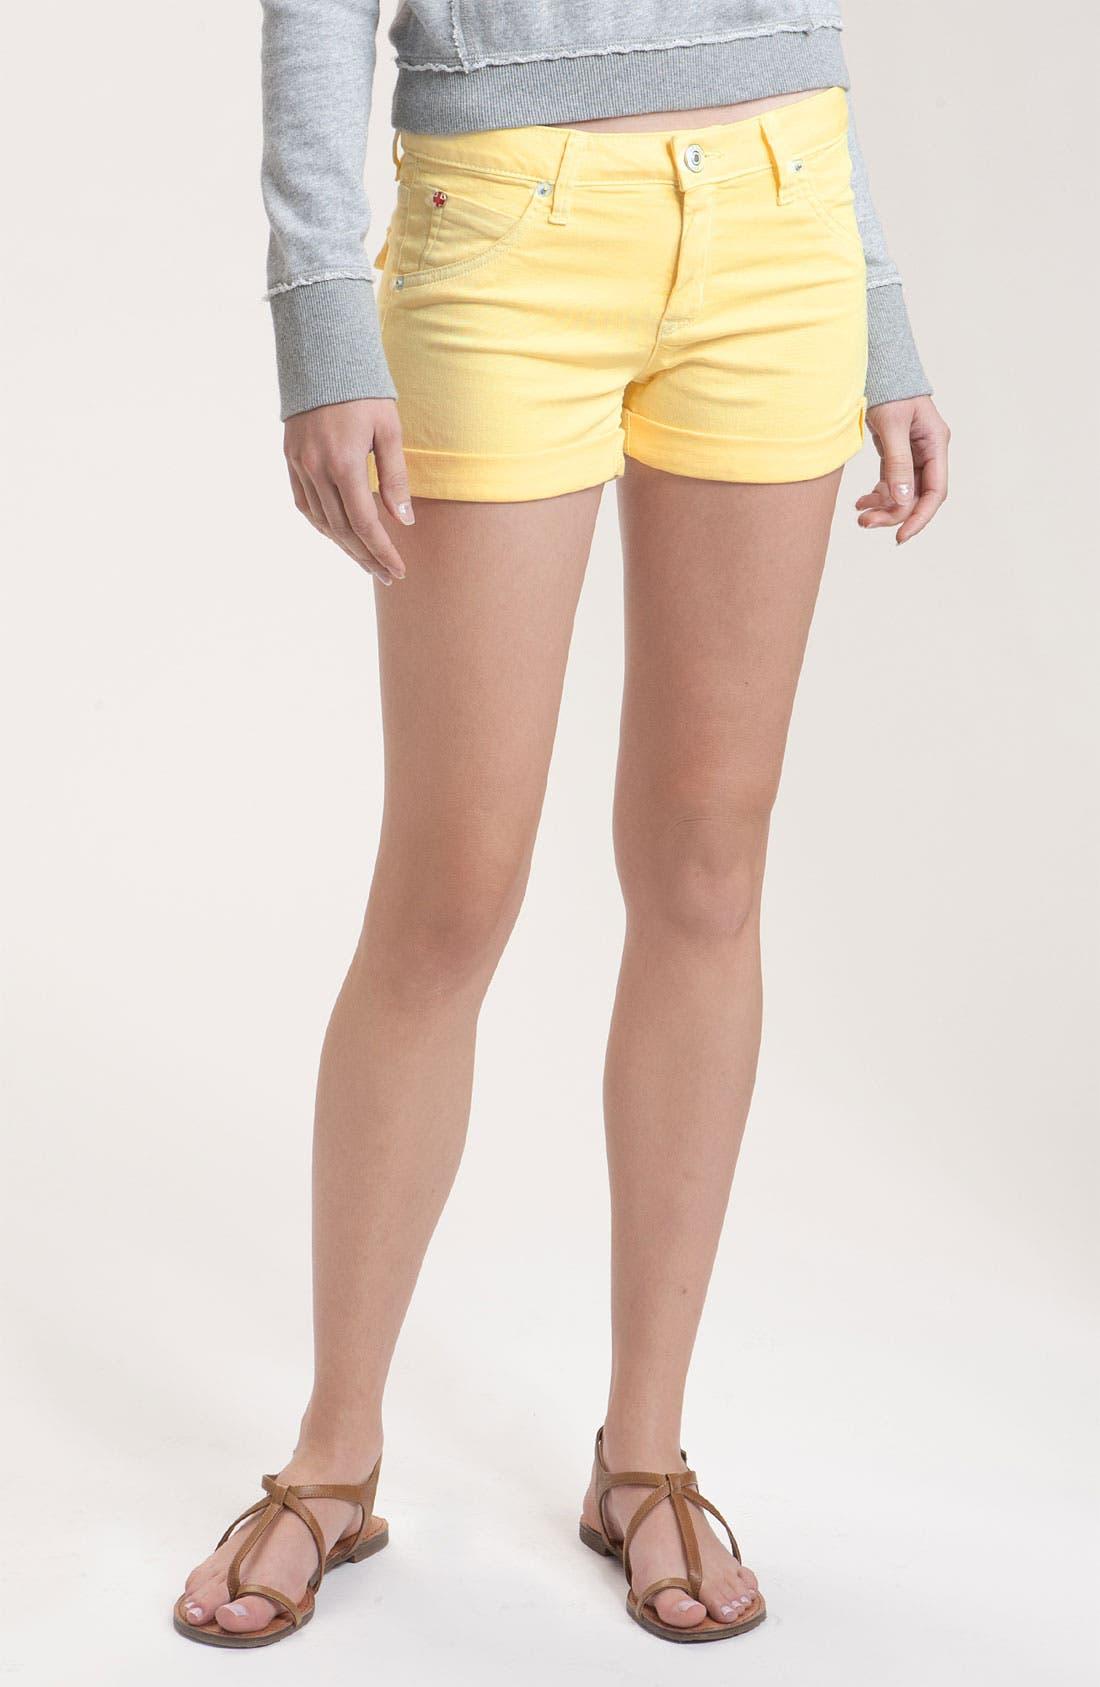 Alternate Image 1 Selected - Hudson Jeans 'Hampton' Denim Shorts (Banana)